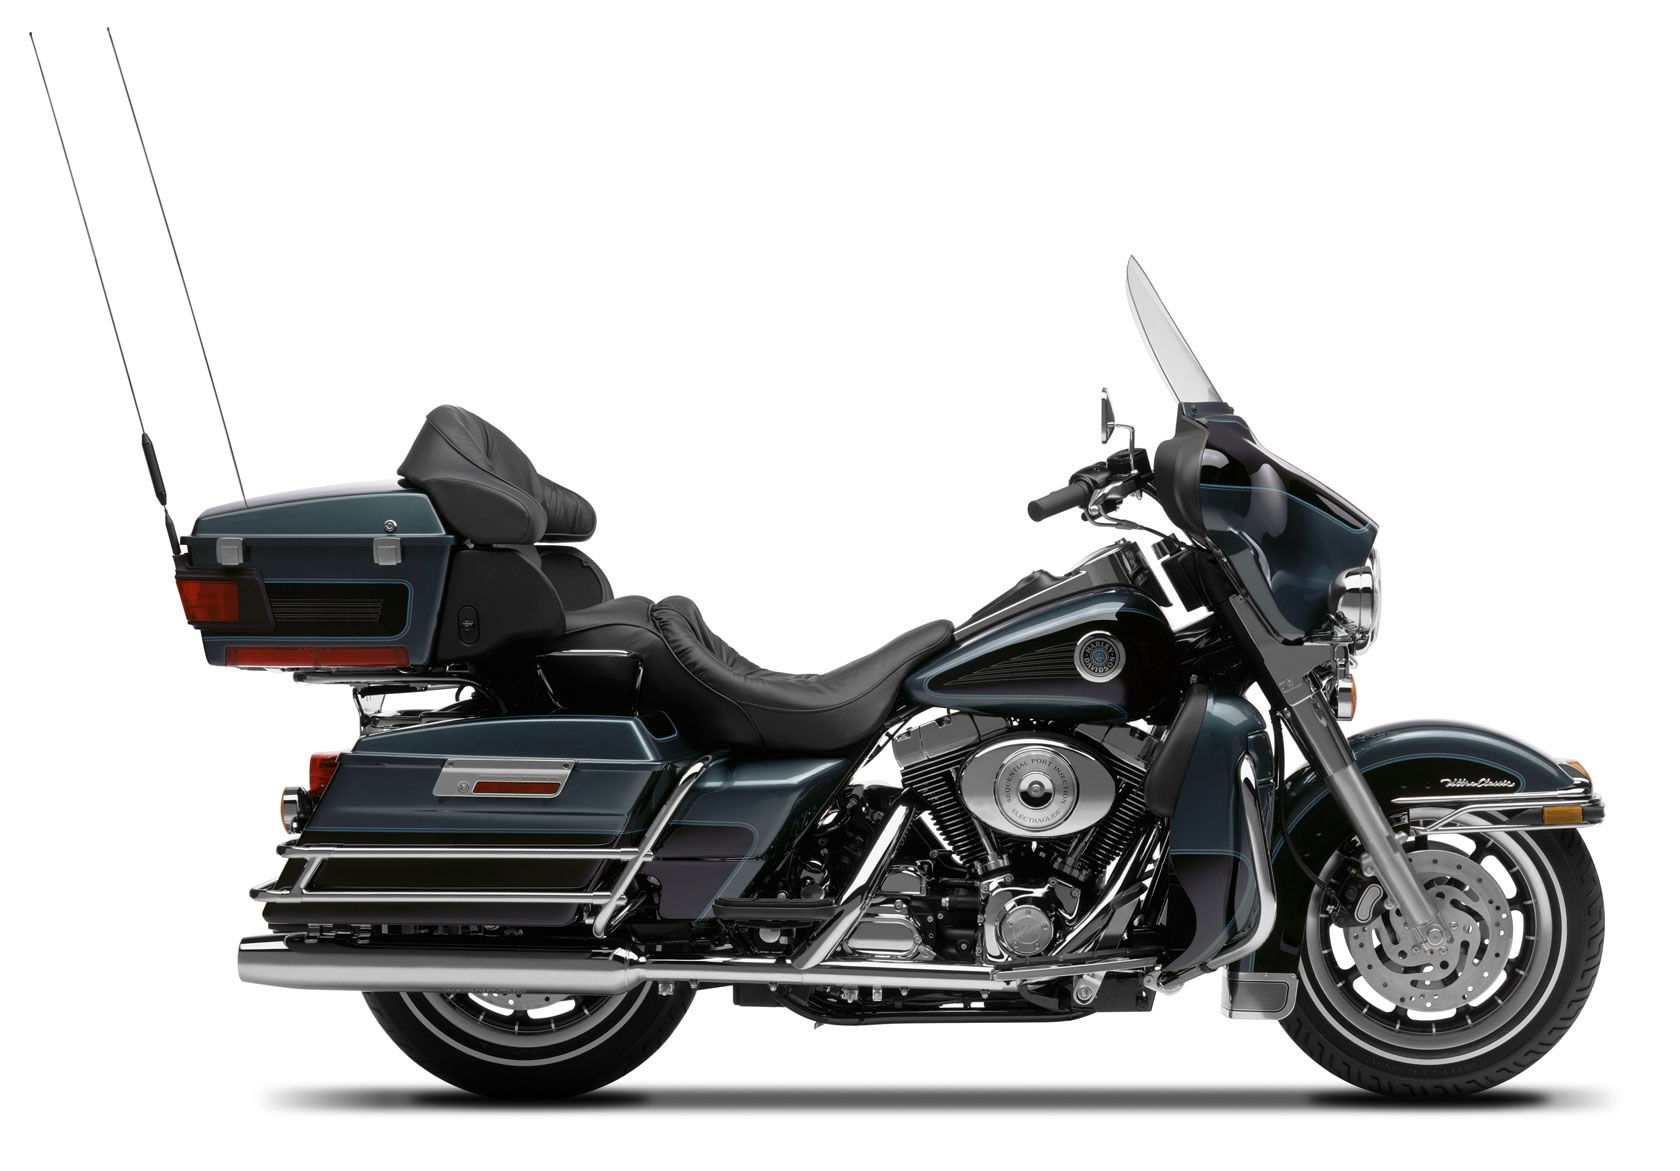 Harley Davidson Ultra Classic Electra Glide Specs - 2000  2001